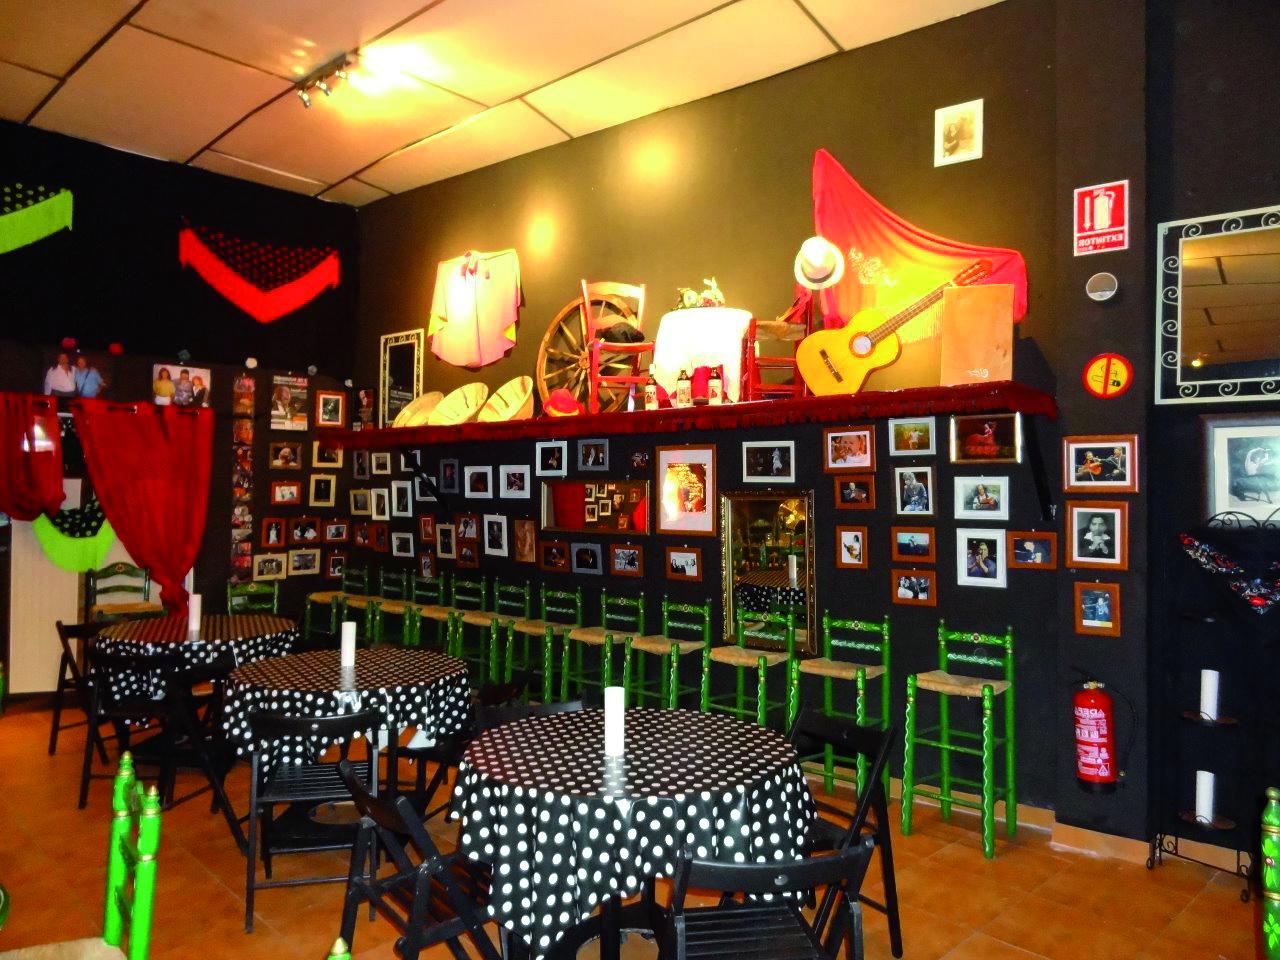 Restaurante La Cabaña Murcia Zwdg Restaurante De La Peà A Flamenca La Zambra La Guà A Go La Guà A Go